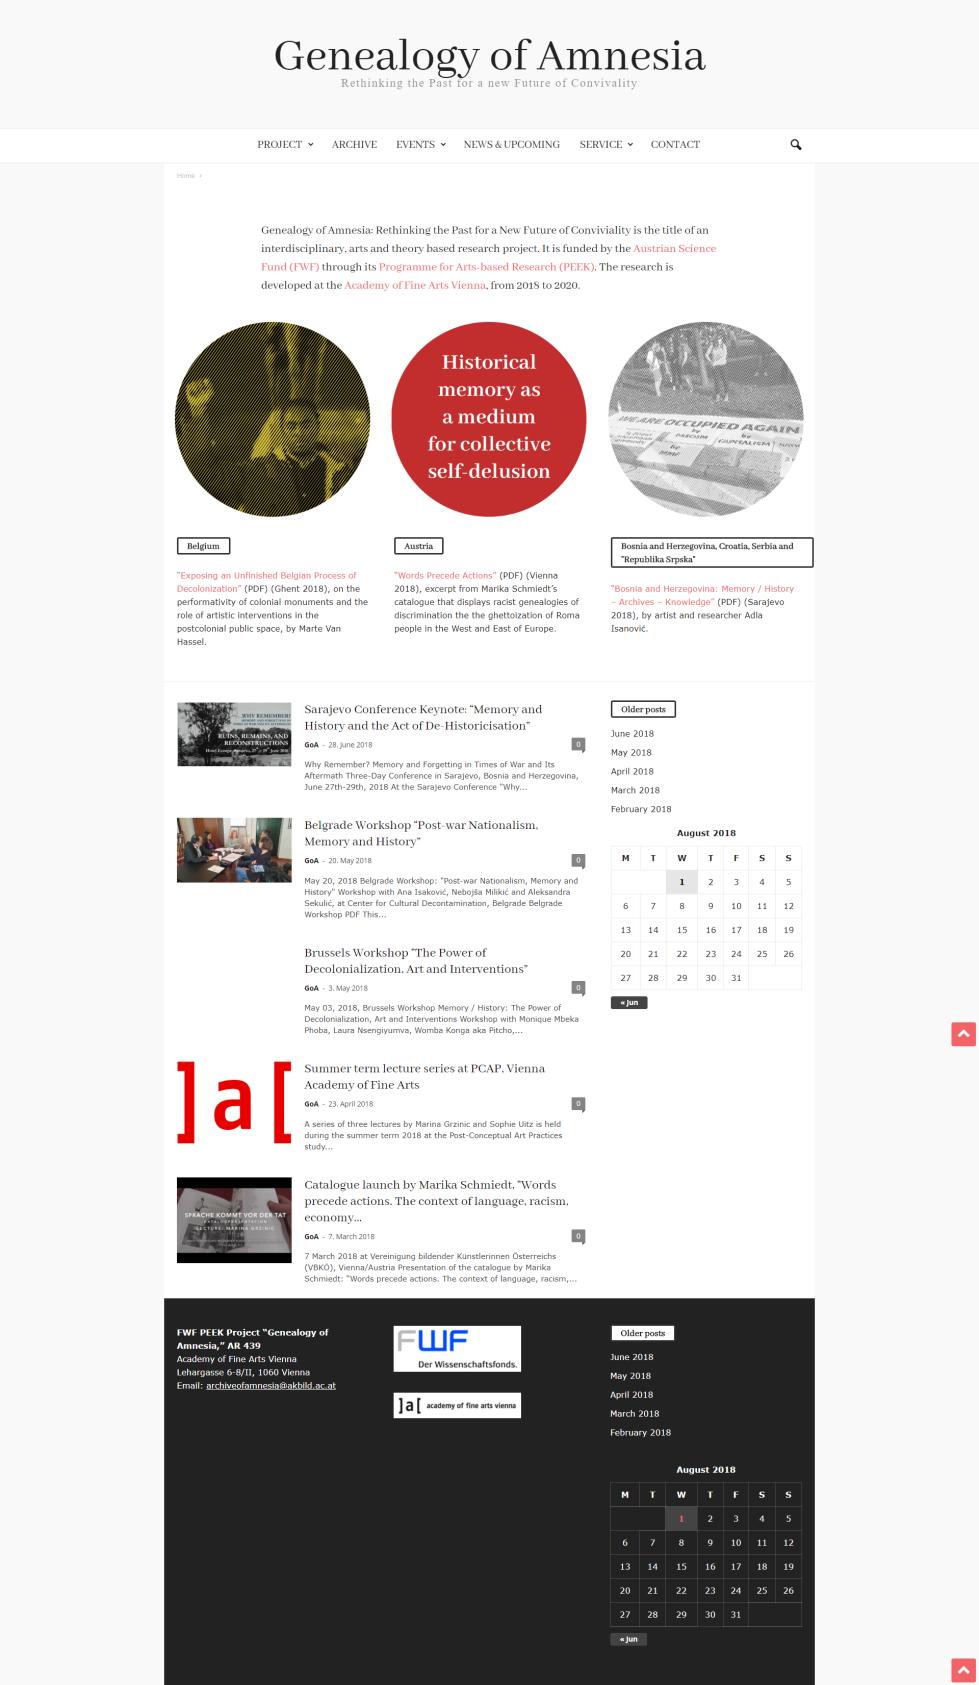 screencapture-archiveofamnesia-akbild-ac-at-2018-08-01-18_20_29.png